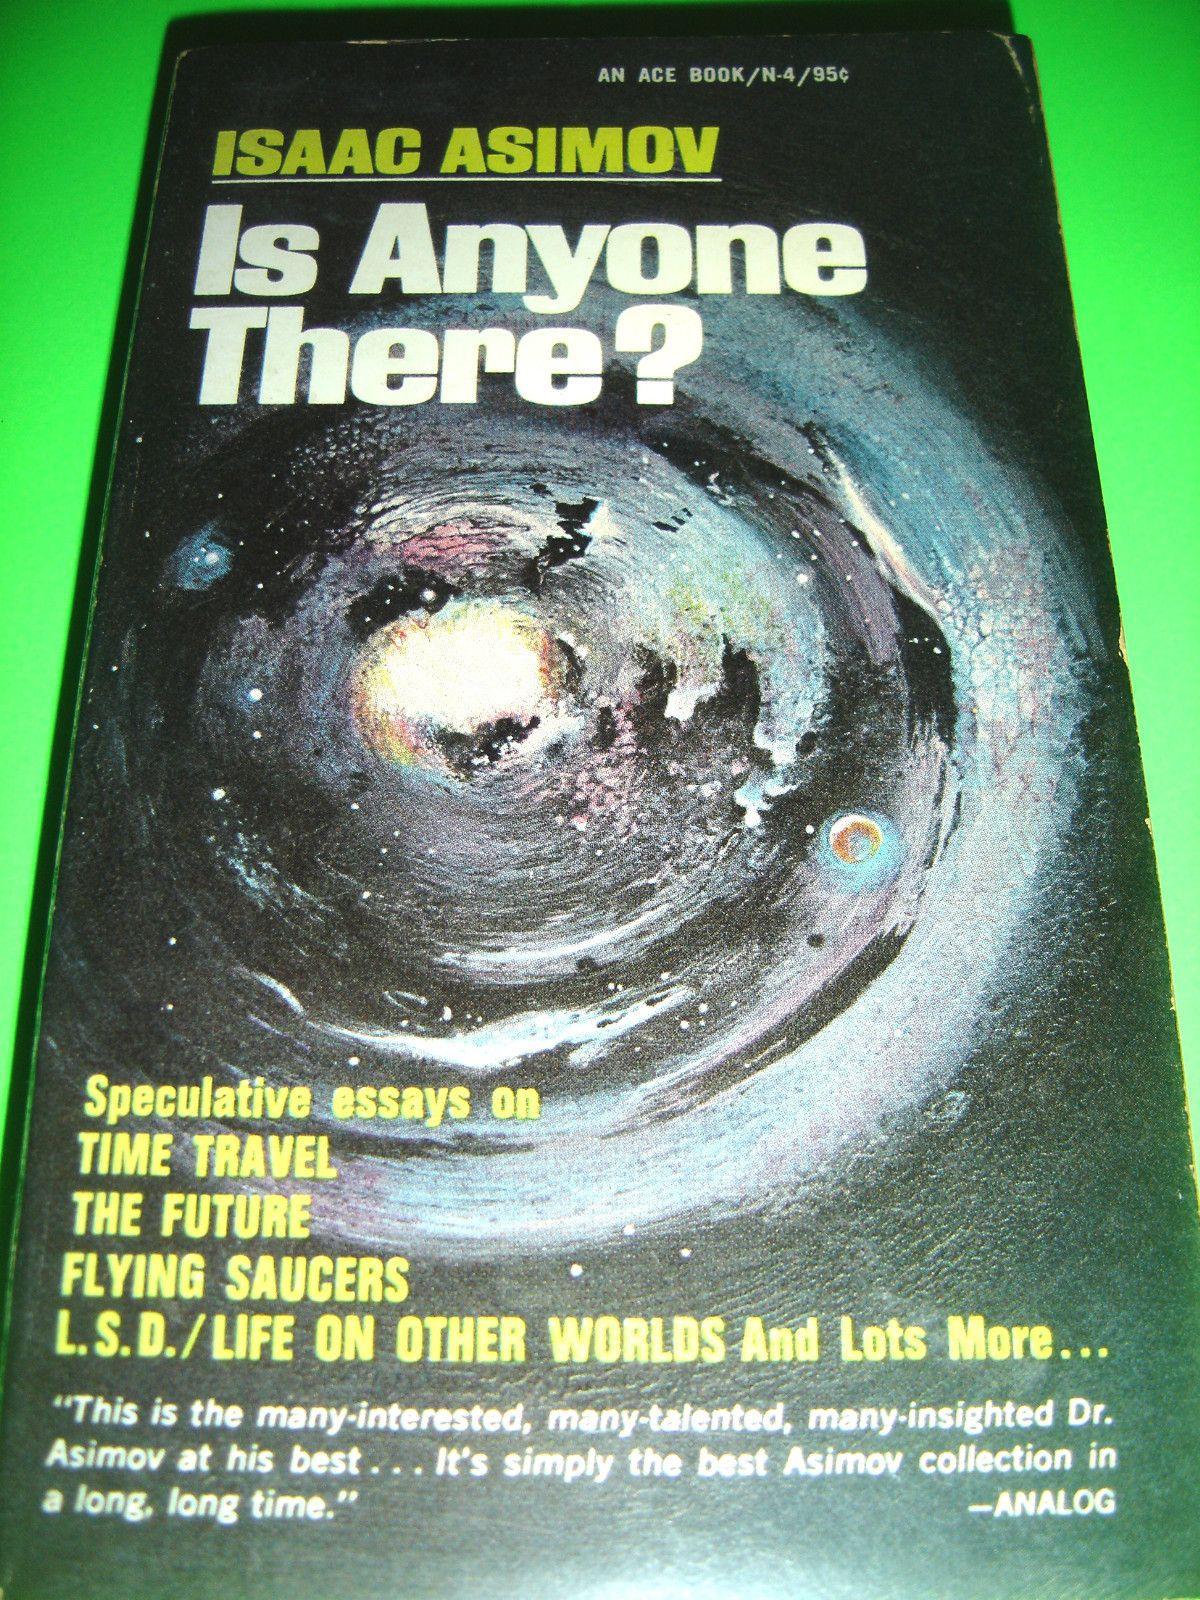 027 Isaac Asimov Essays Essay Awful On Creativity Intelligence Full